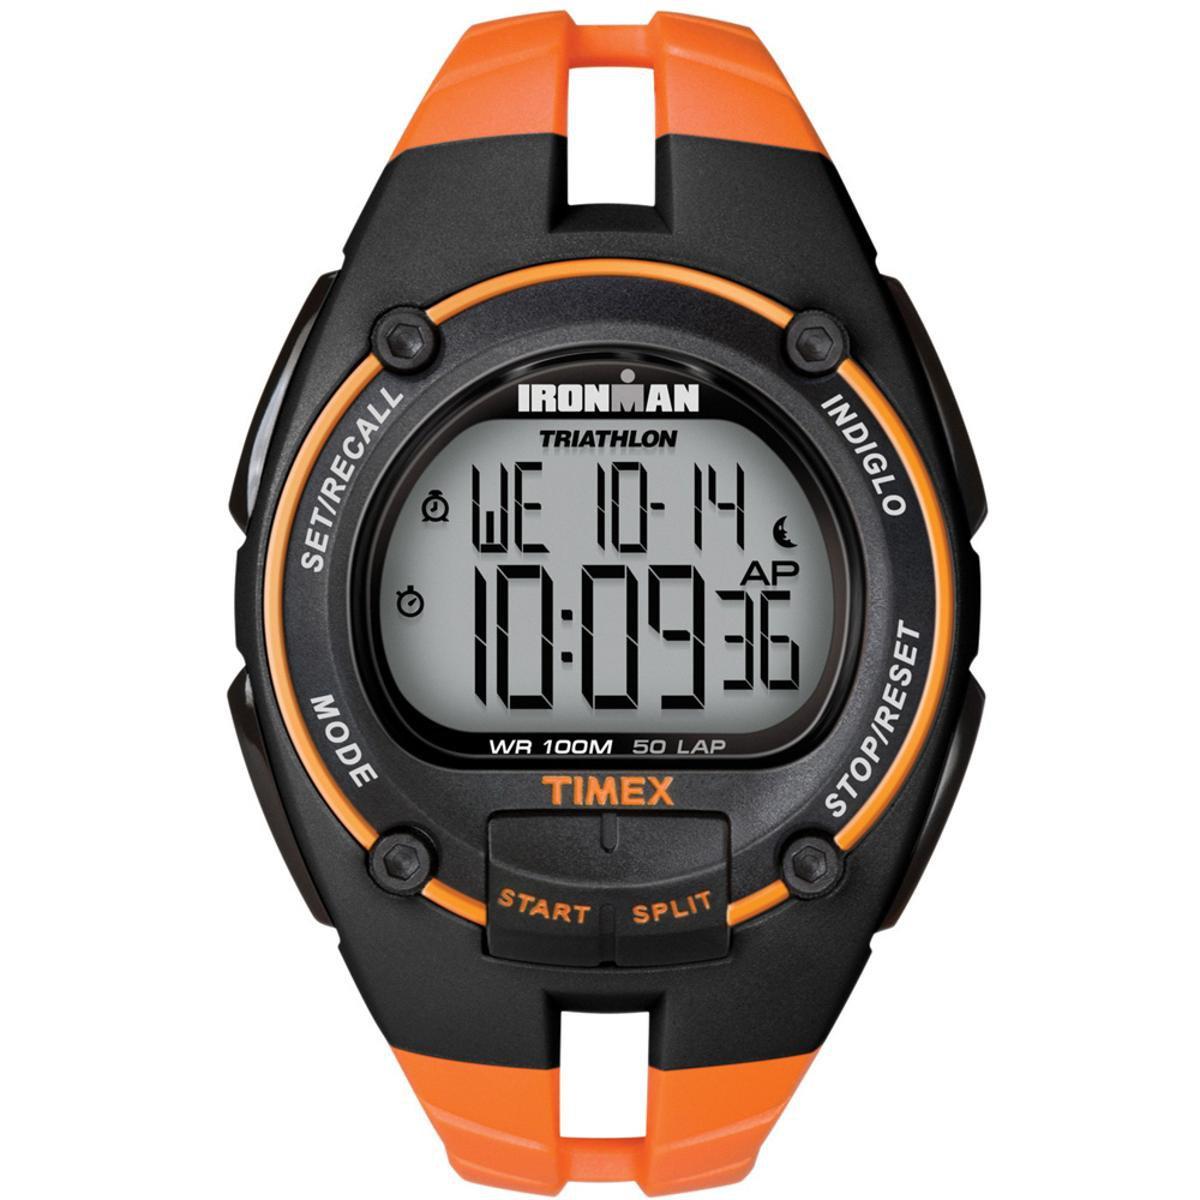 a498f64712a6 Relógio Timex Masculino Ironman 50-Lap TI5K220 N Laranja TI5K220 N - Compre  Agora